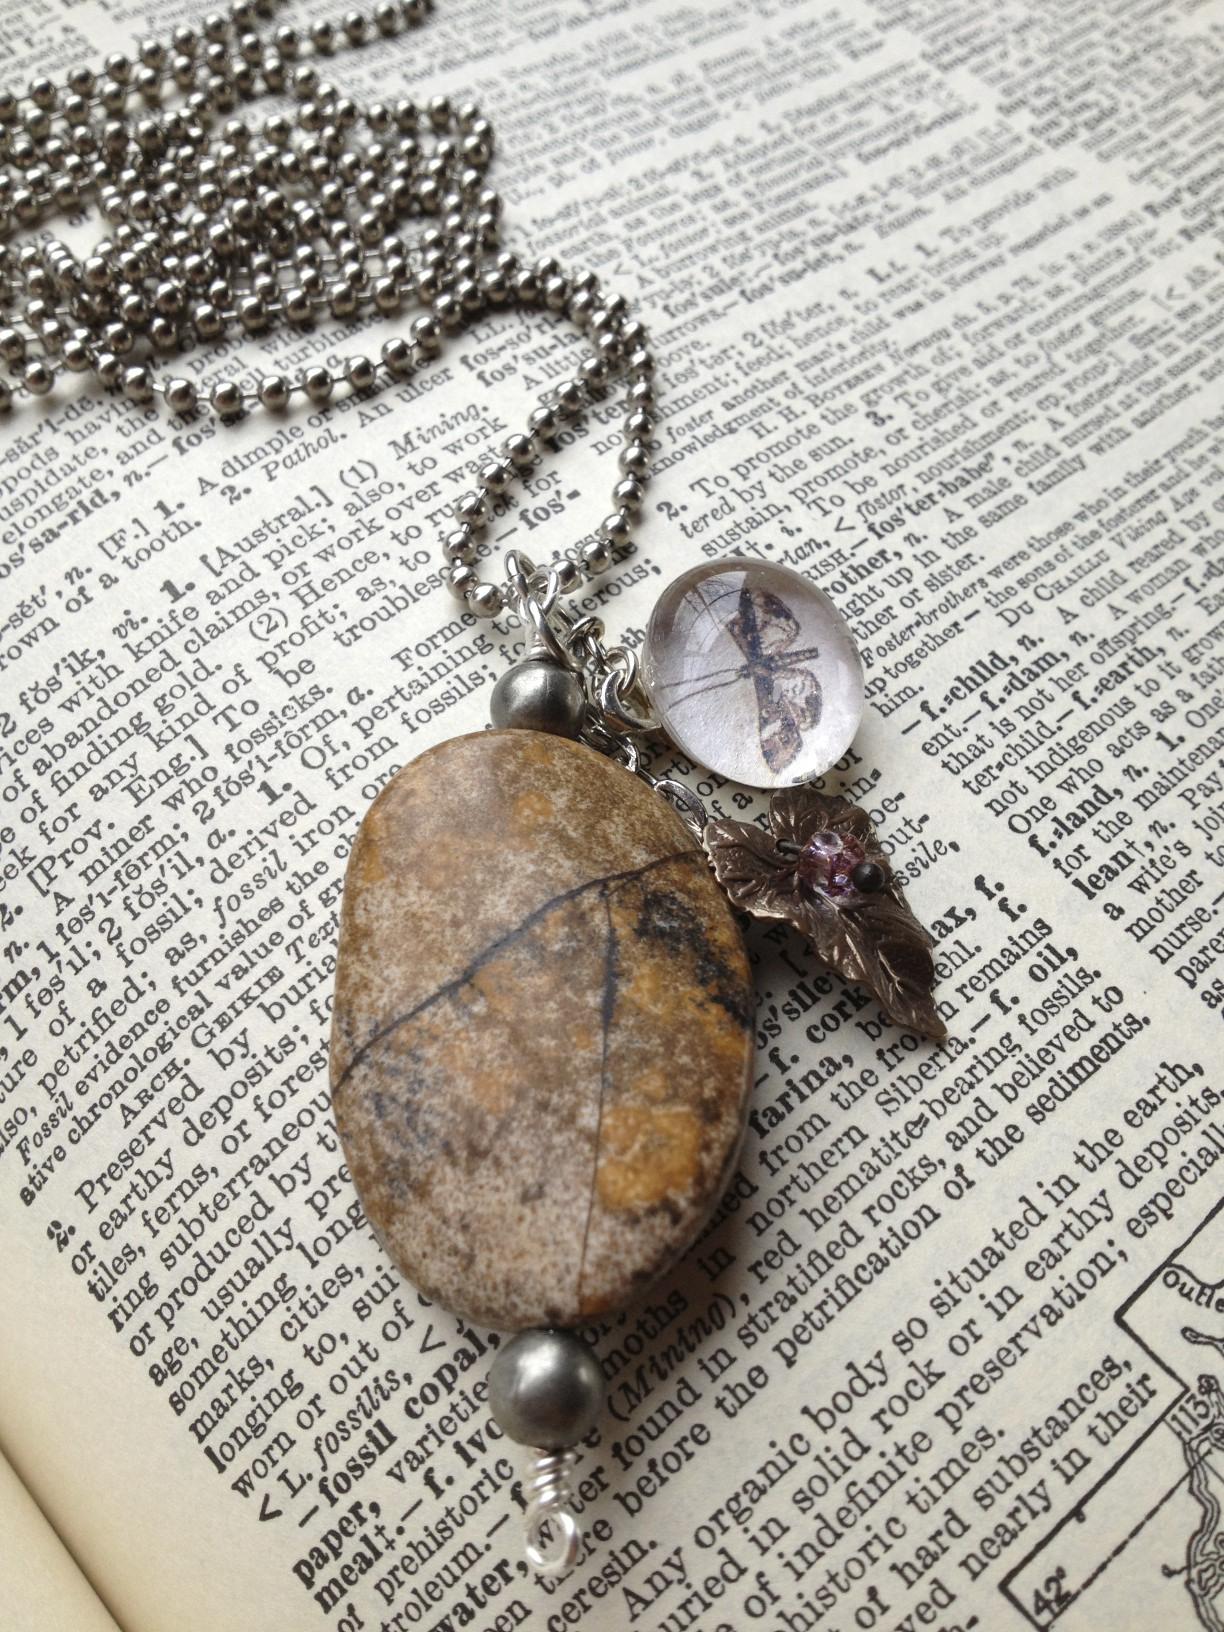 The Fossil Hunter Necklace by local, Gig Harbor artist, Jennifer Preston Chushcoff